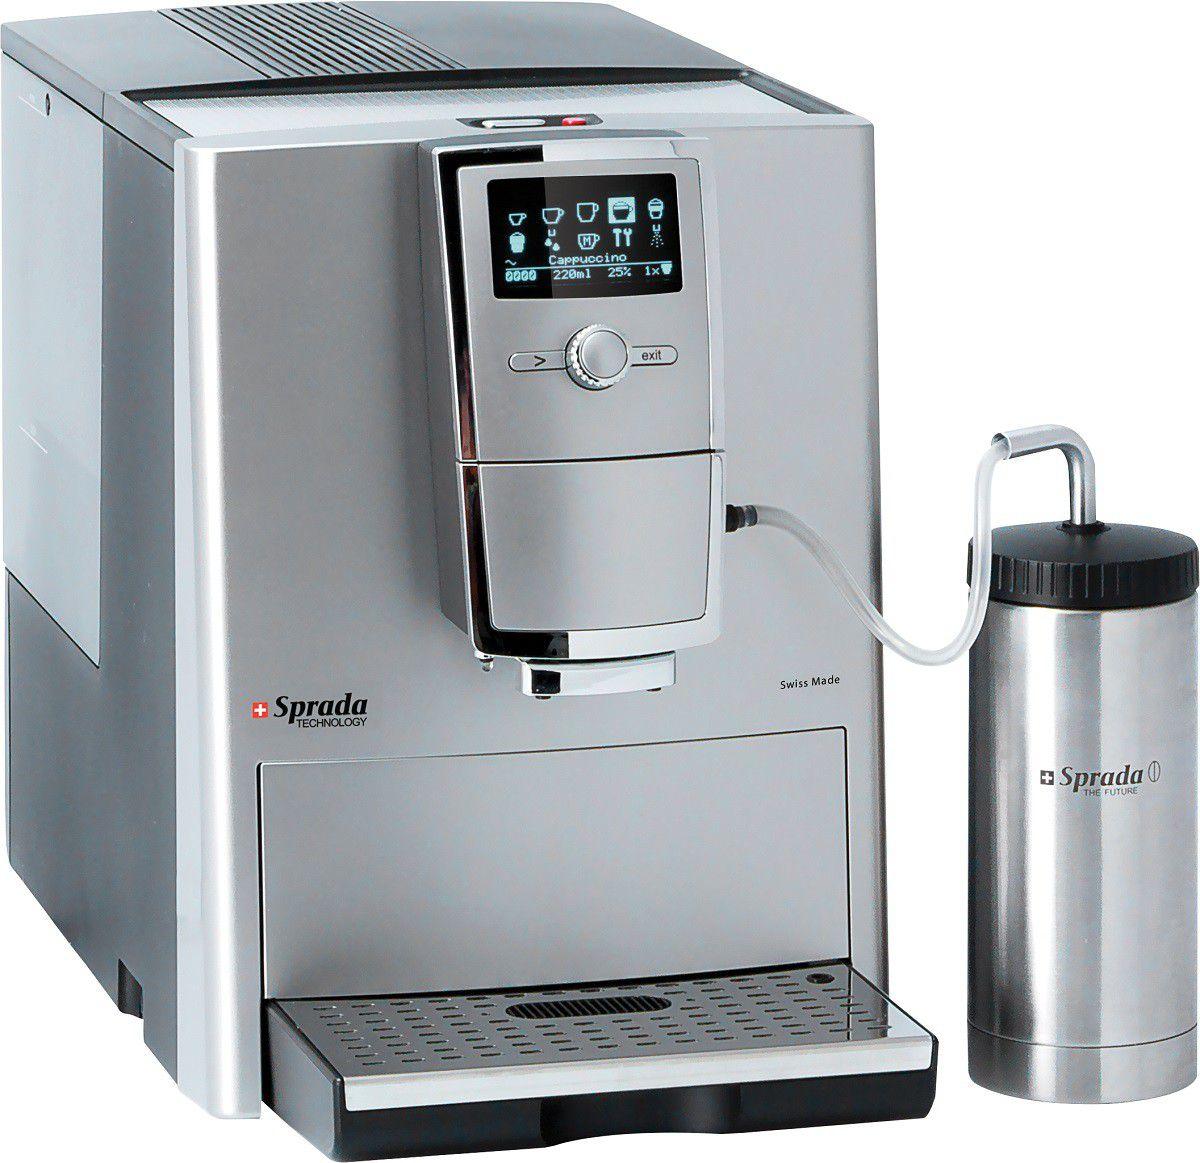 Sprada Coffee Sprada Tx7 Fully Automatic Coffee Machine